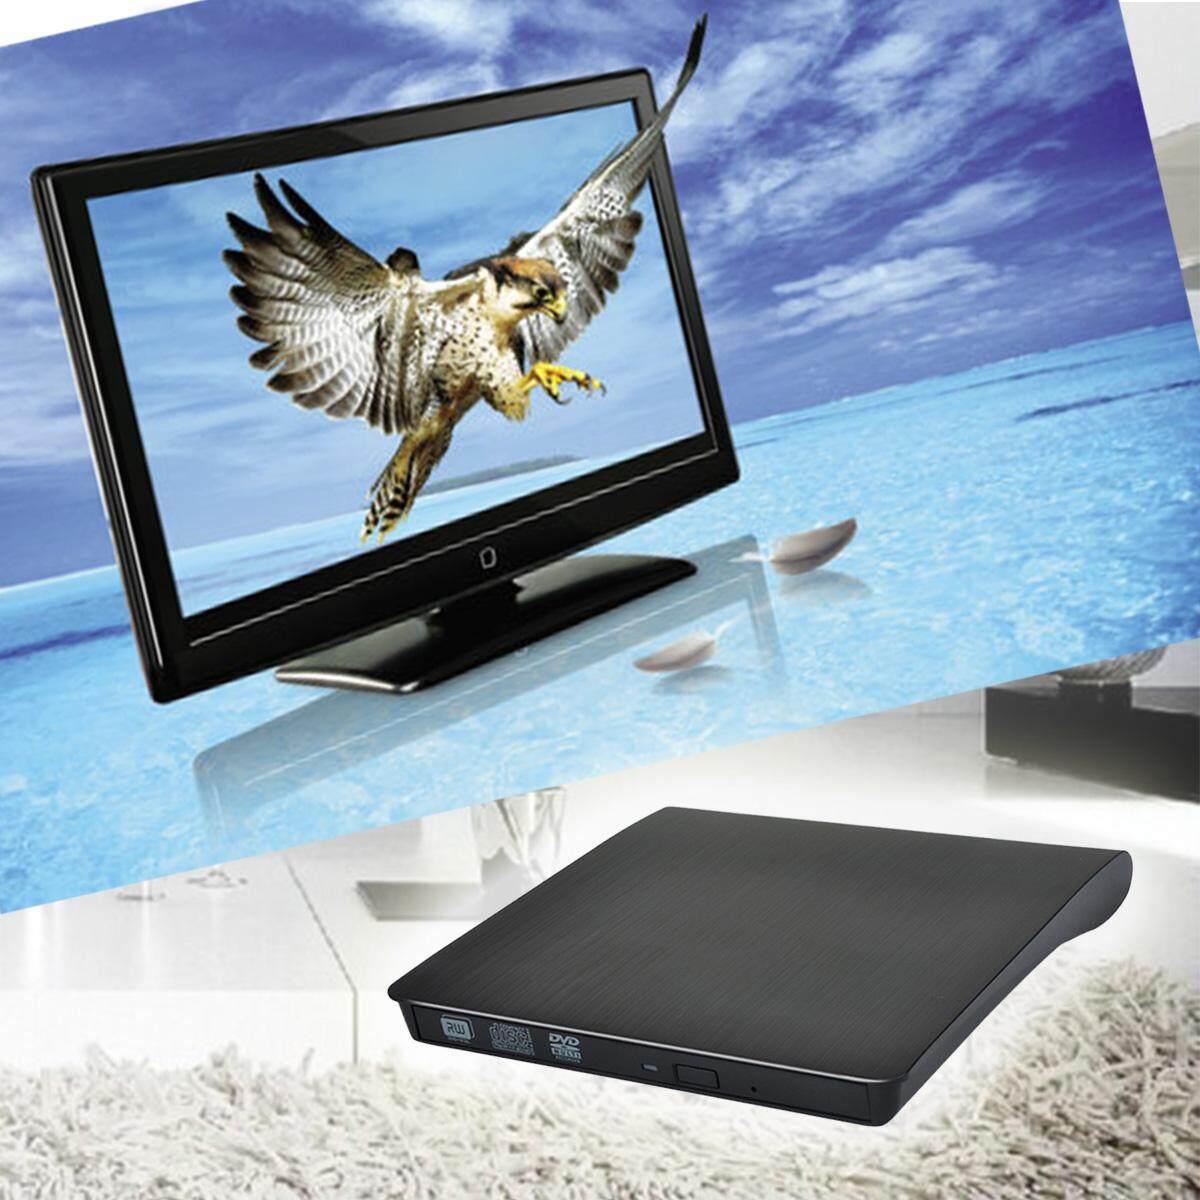 Slim External USB 3.0 CD DVD DVDRW Burner Writer Drive for Laptop Black